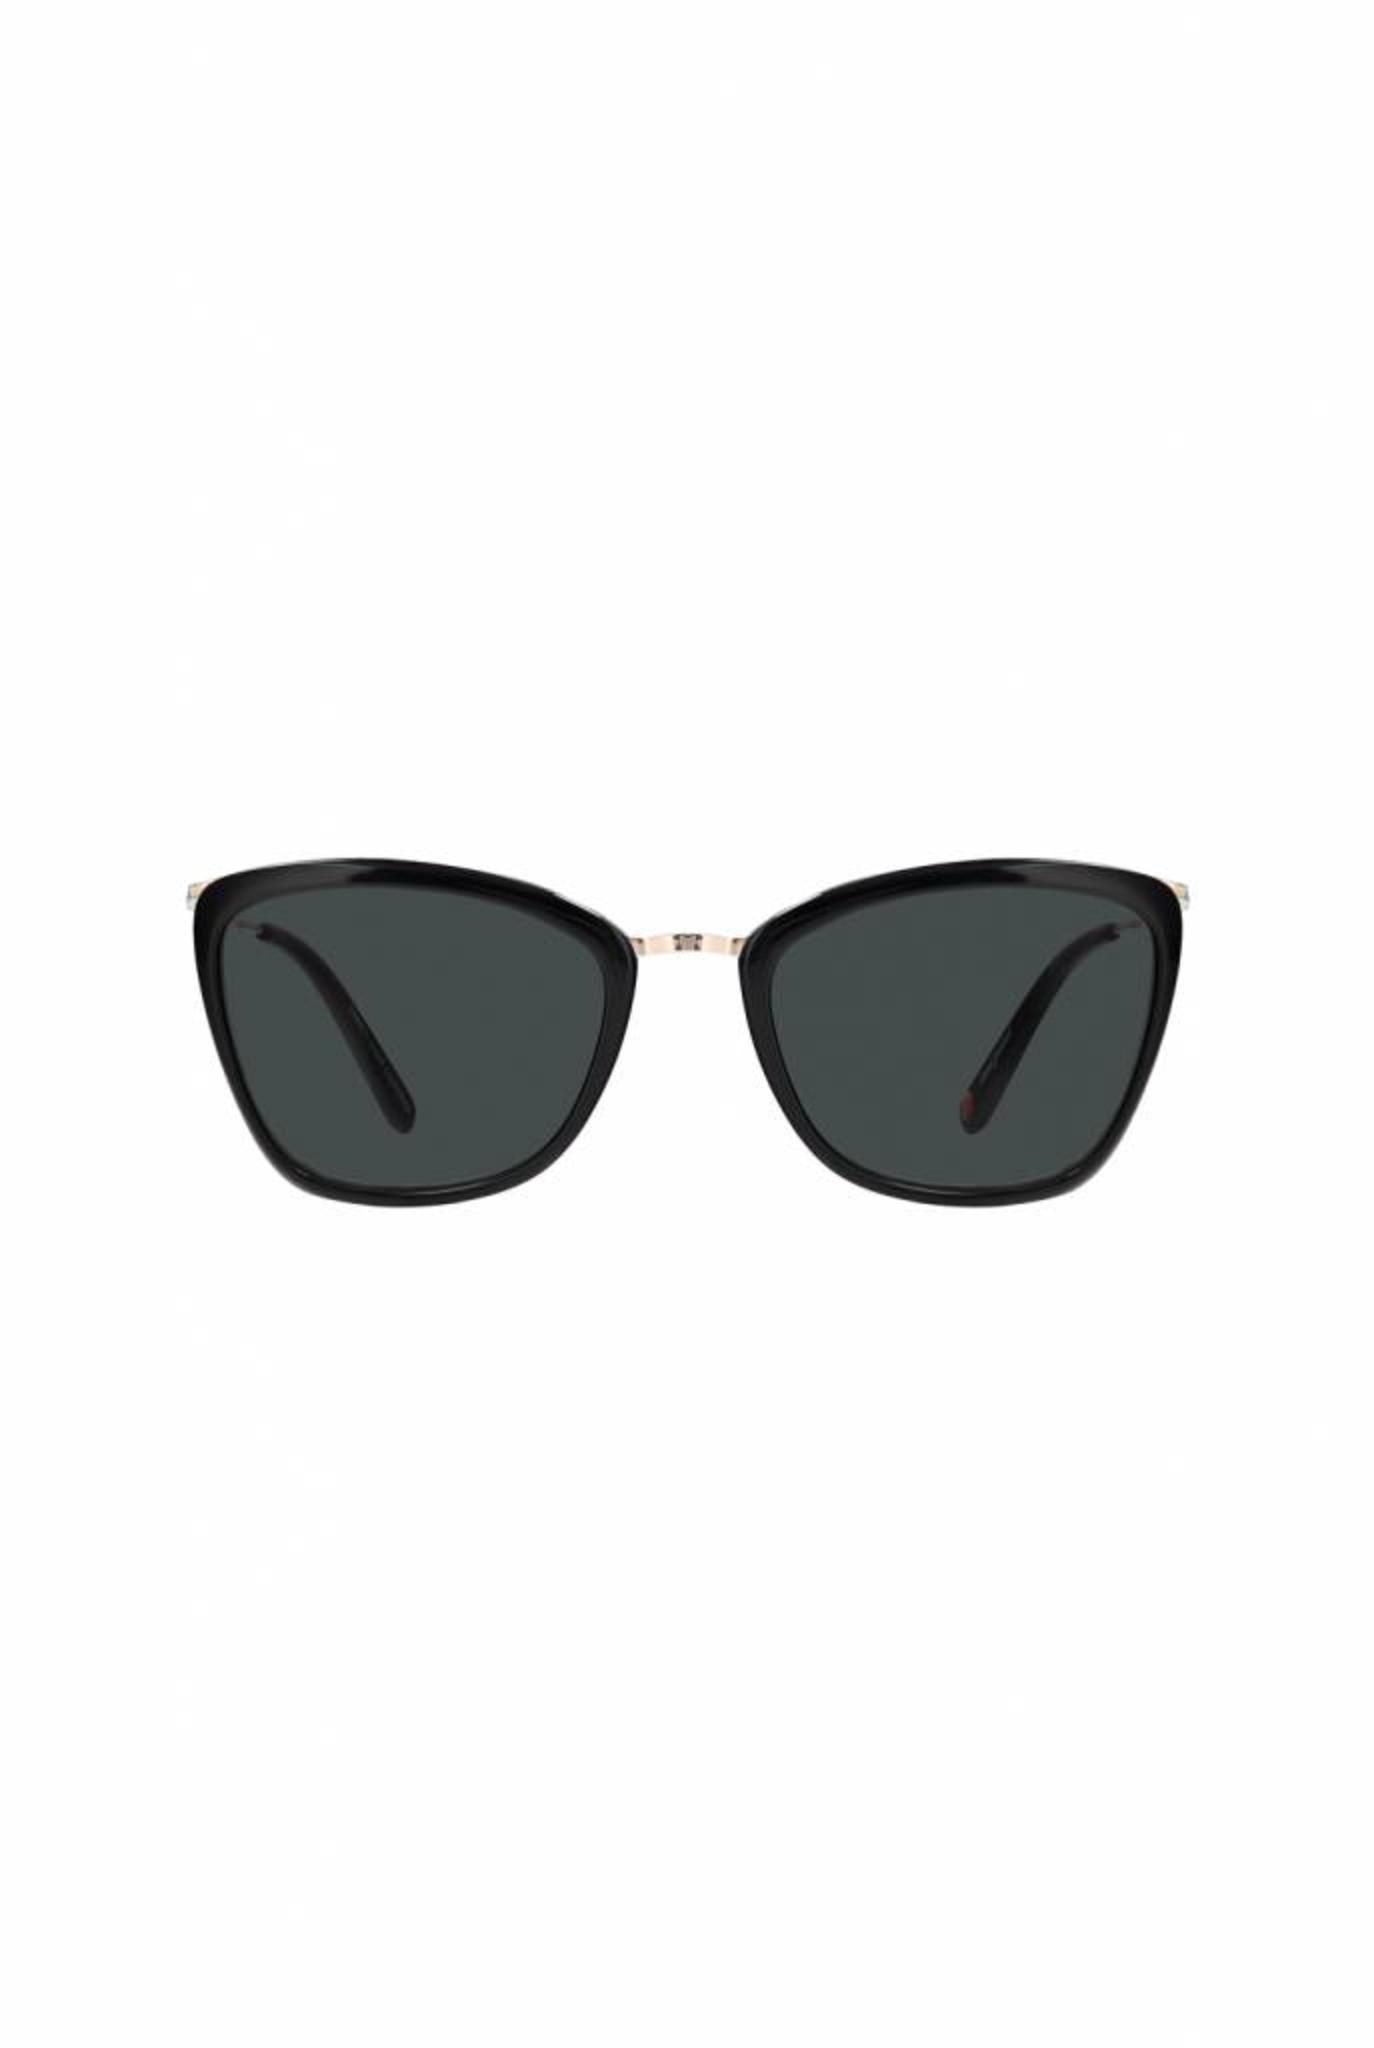 Louella sunglasses Black-Gold/Semi-Flat Black